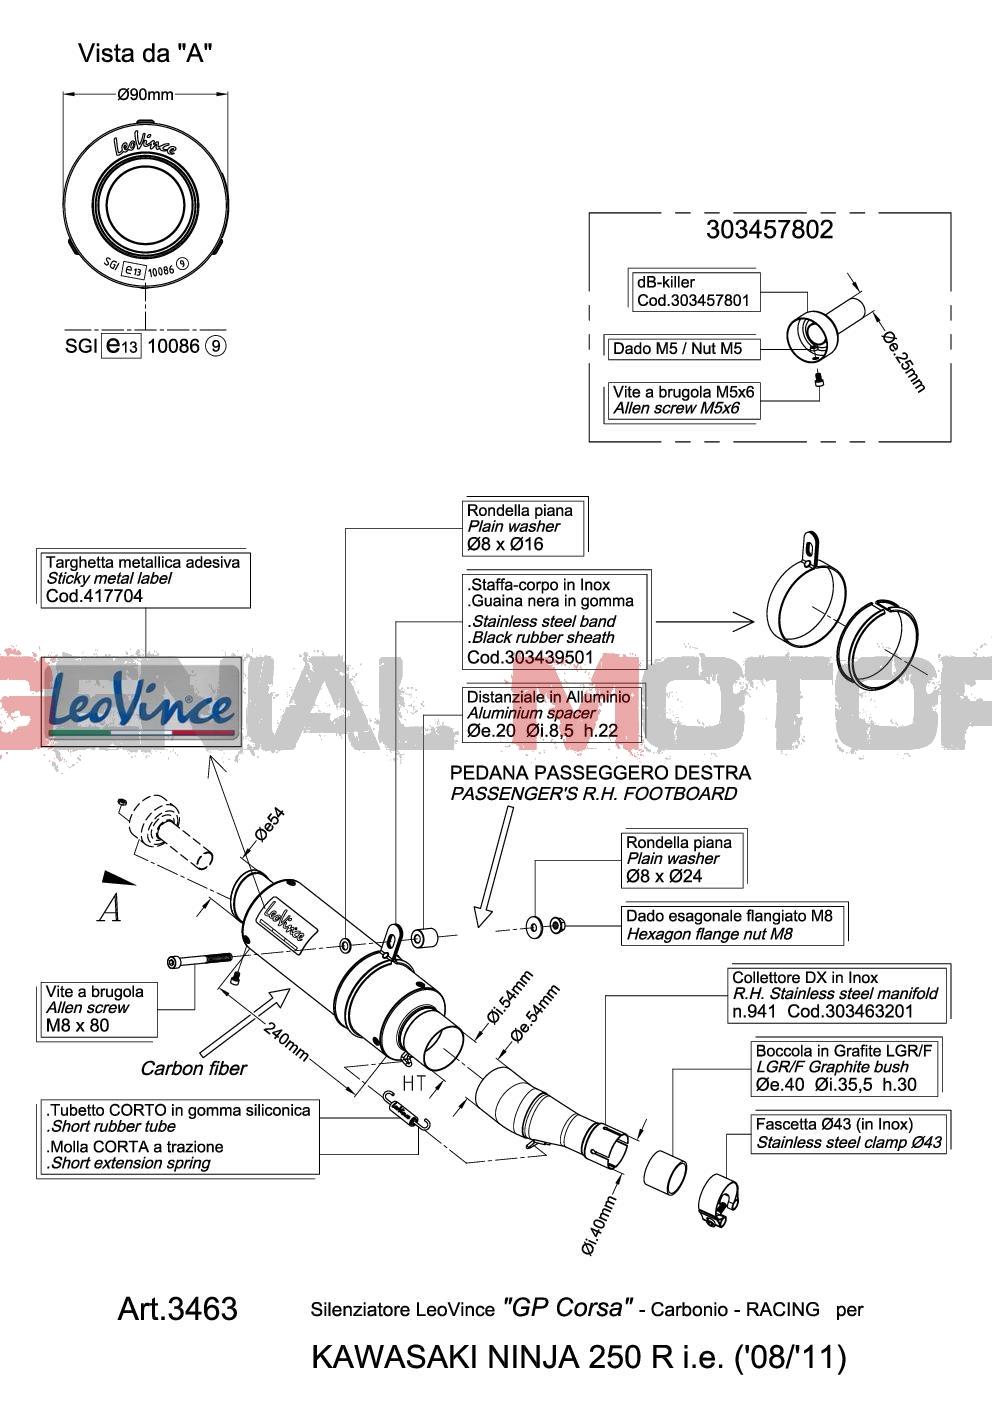 Exhaust Leovince Gp Corsa Carbon Fiber Kawasaki Ninja 250